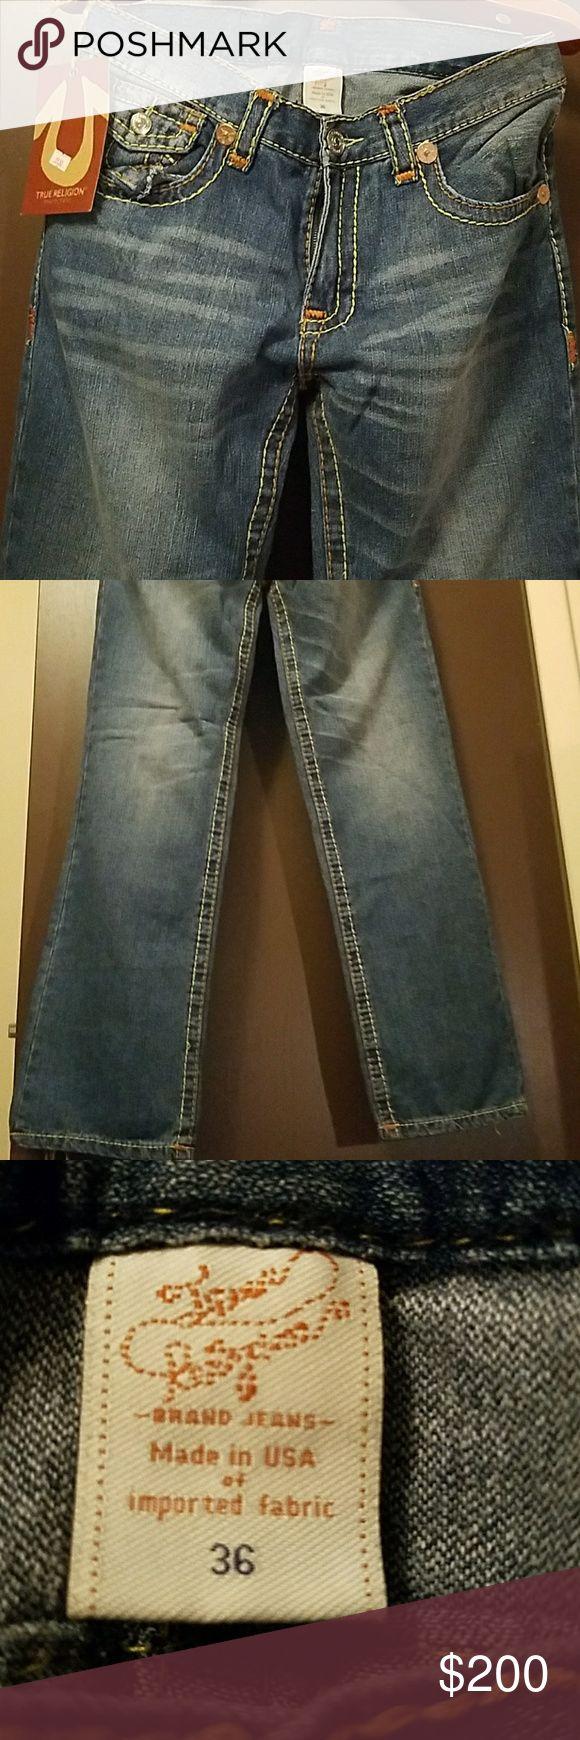 True religion mens jeans True religion men jeans. Brand New with tags True Religion Jeans Straight #mensjeansbrands